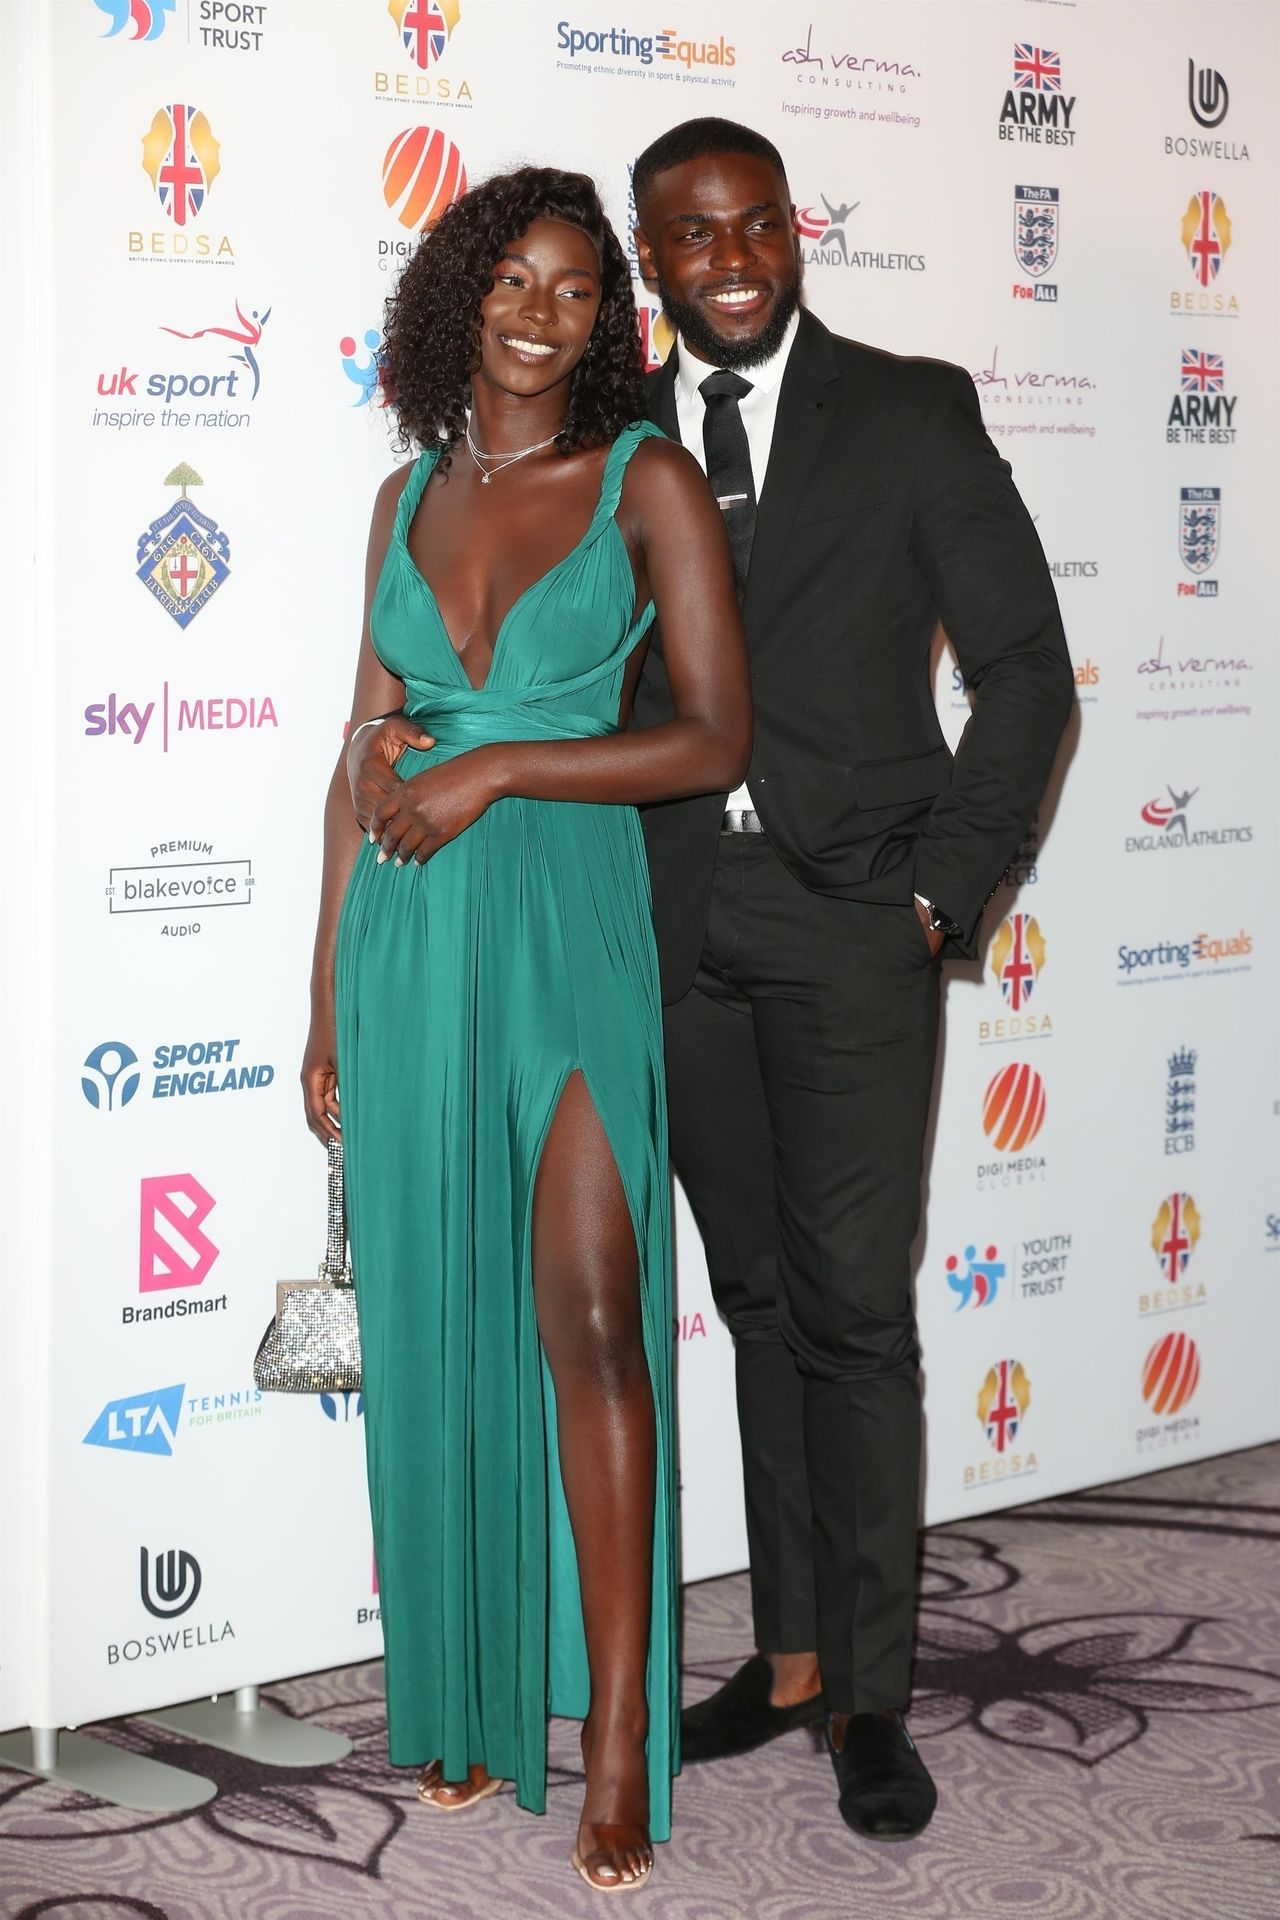 Mike Boateng & Priscilla Anyabu Are Seen At British Ethnic Diversity Sports Awards 0044